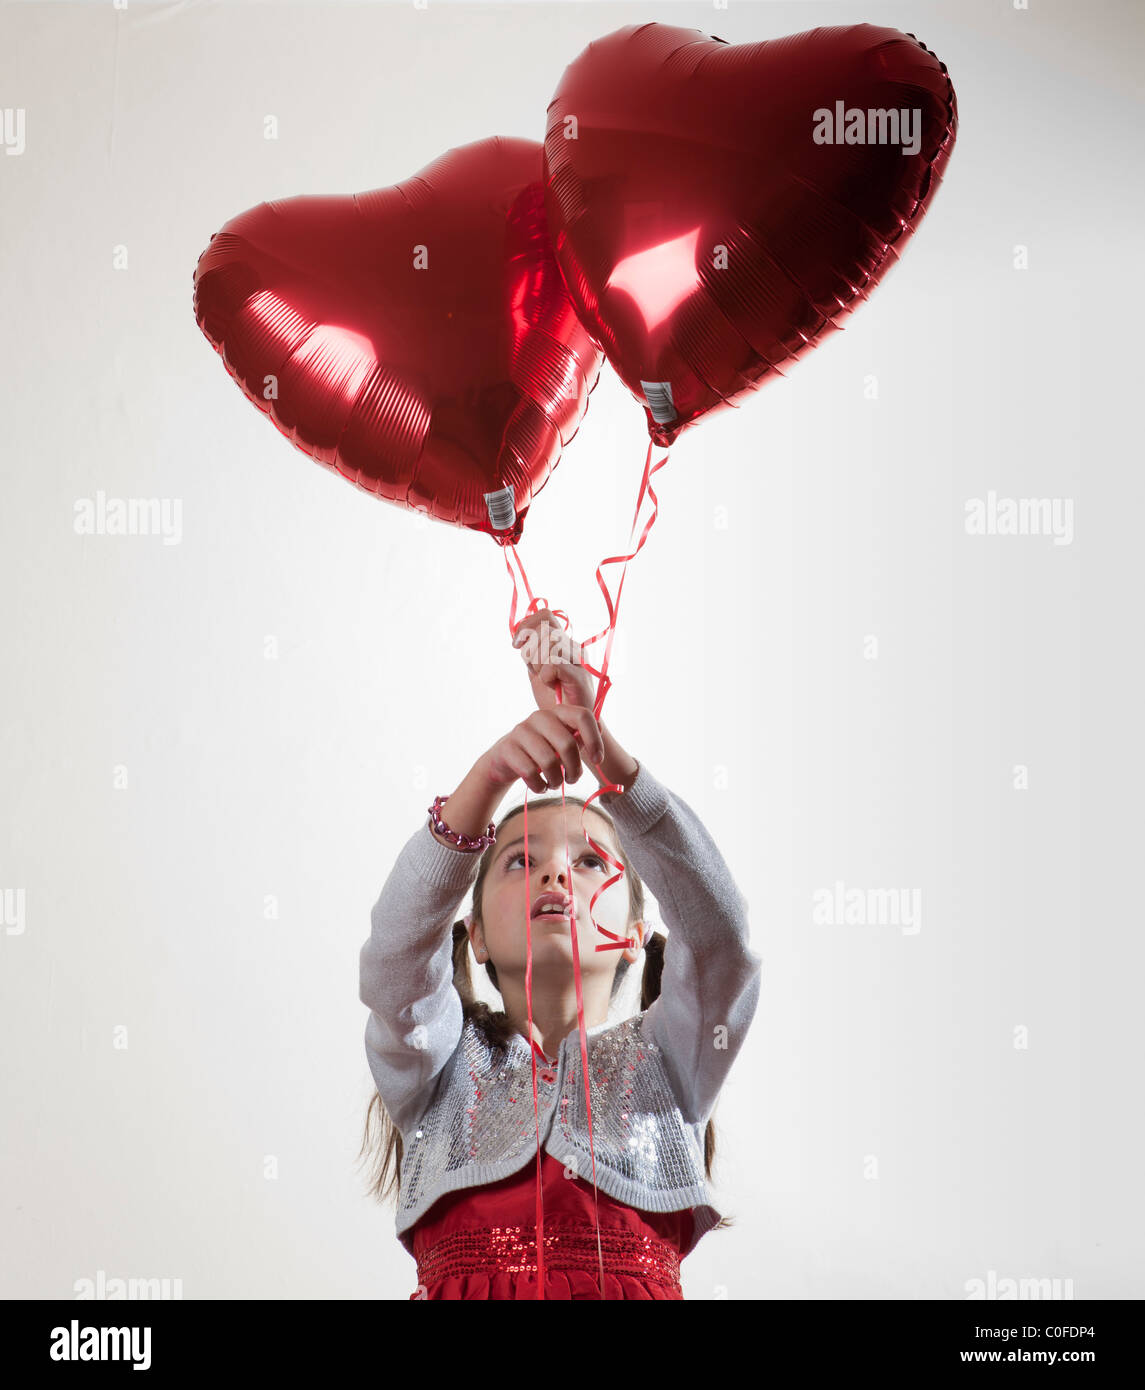 happy girl holding a heart shaped balloon - Stock Image